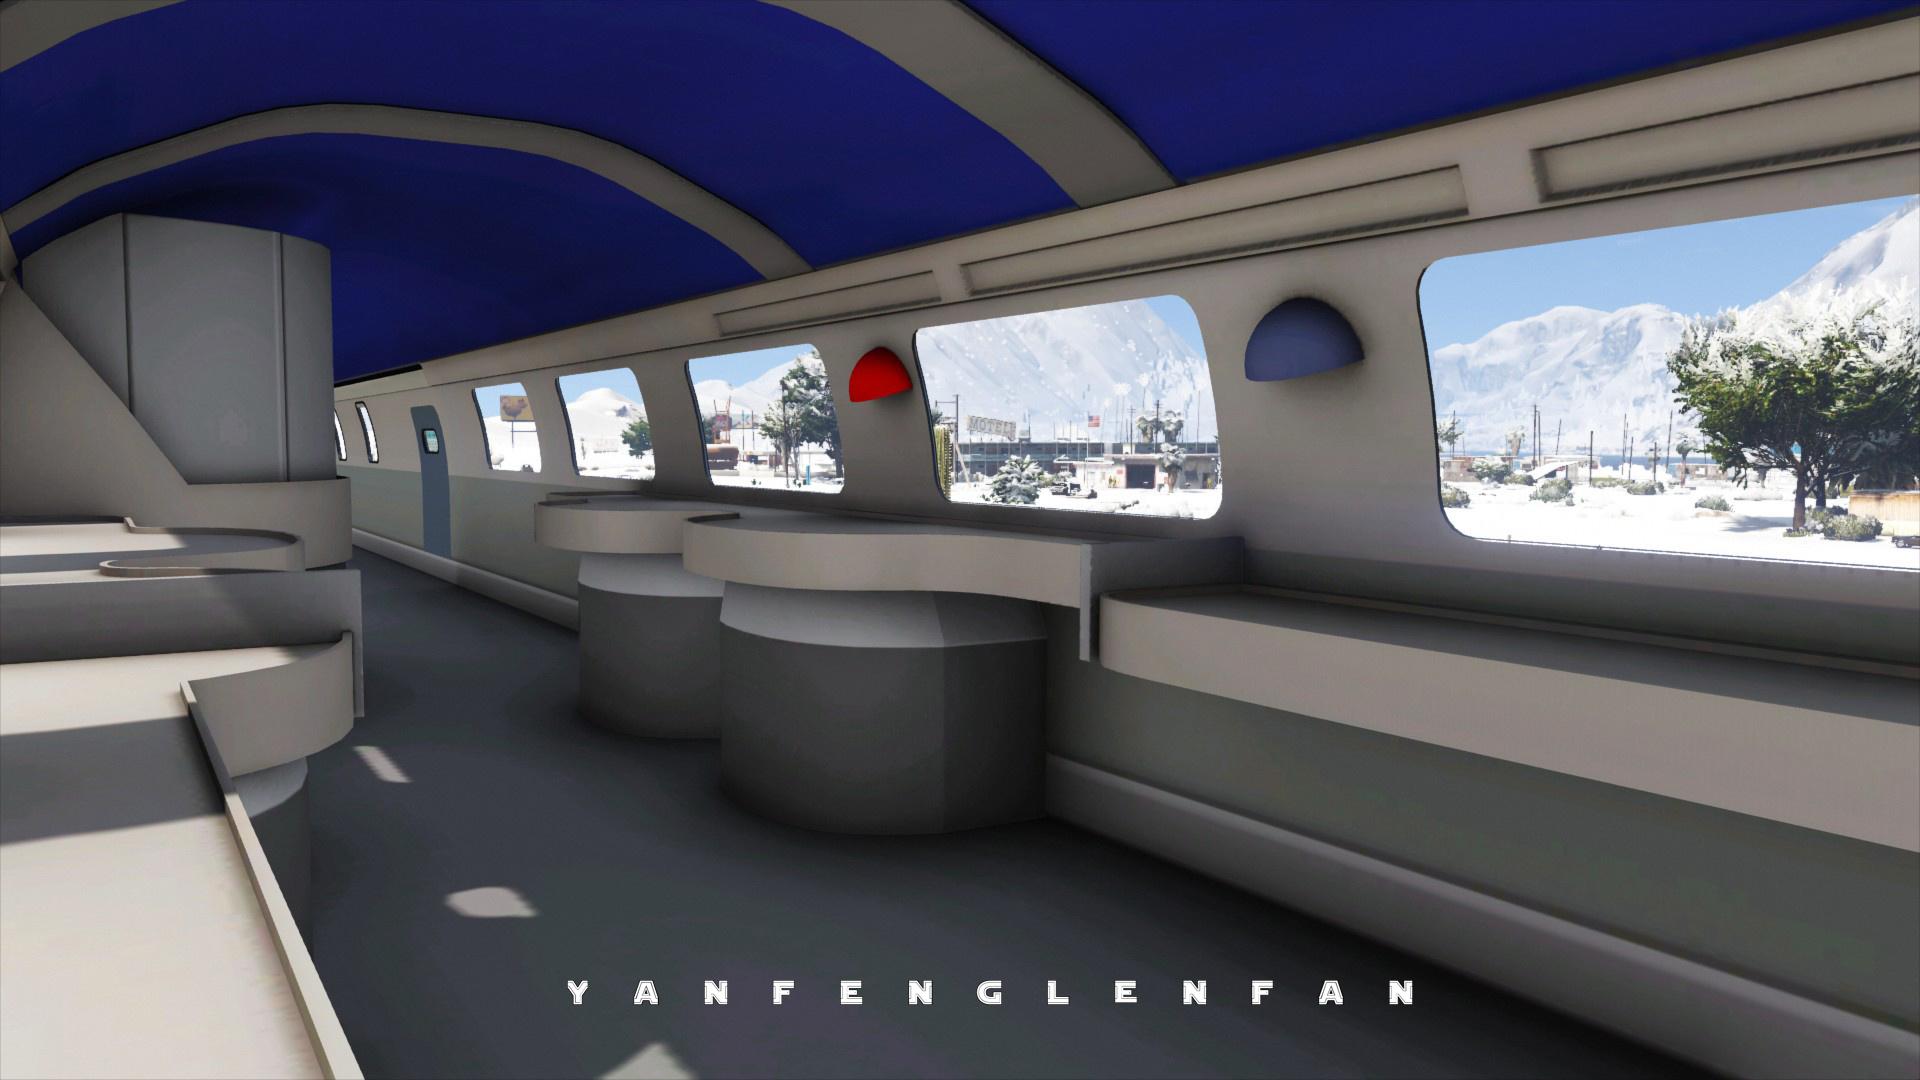 6 Passenger Vehicles >> SNCF TGV Duplex high-speed train 法国国铁双层高速动车组 [ Add-On HD ...